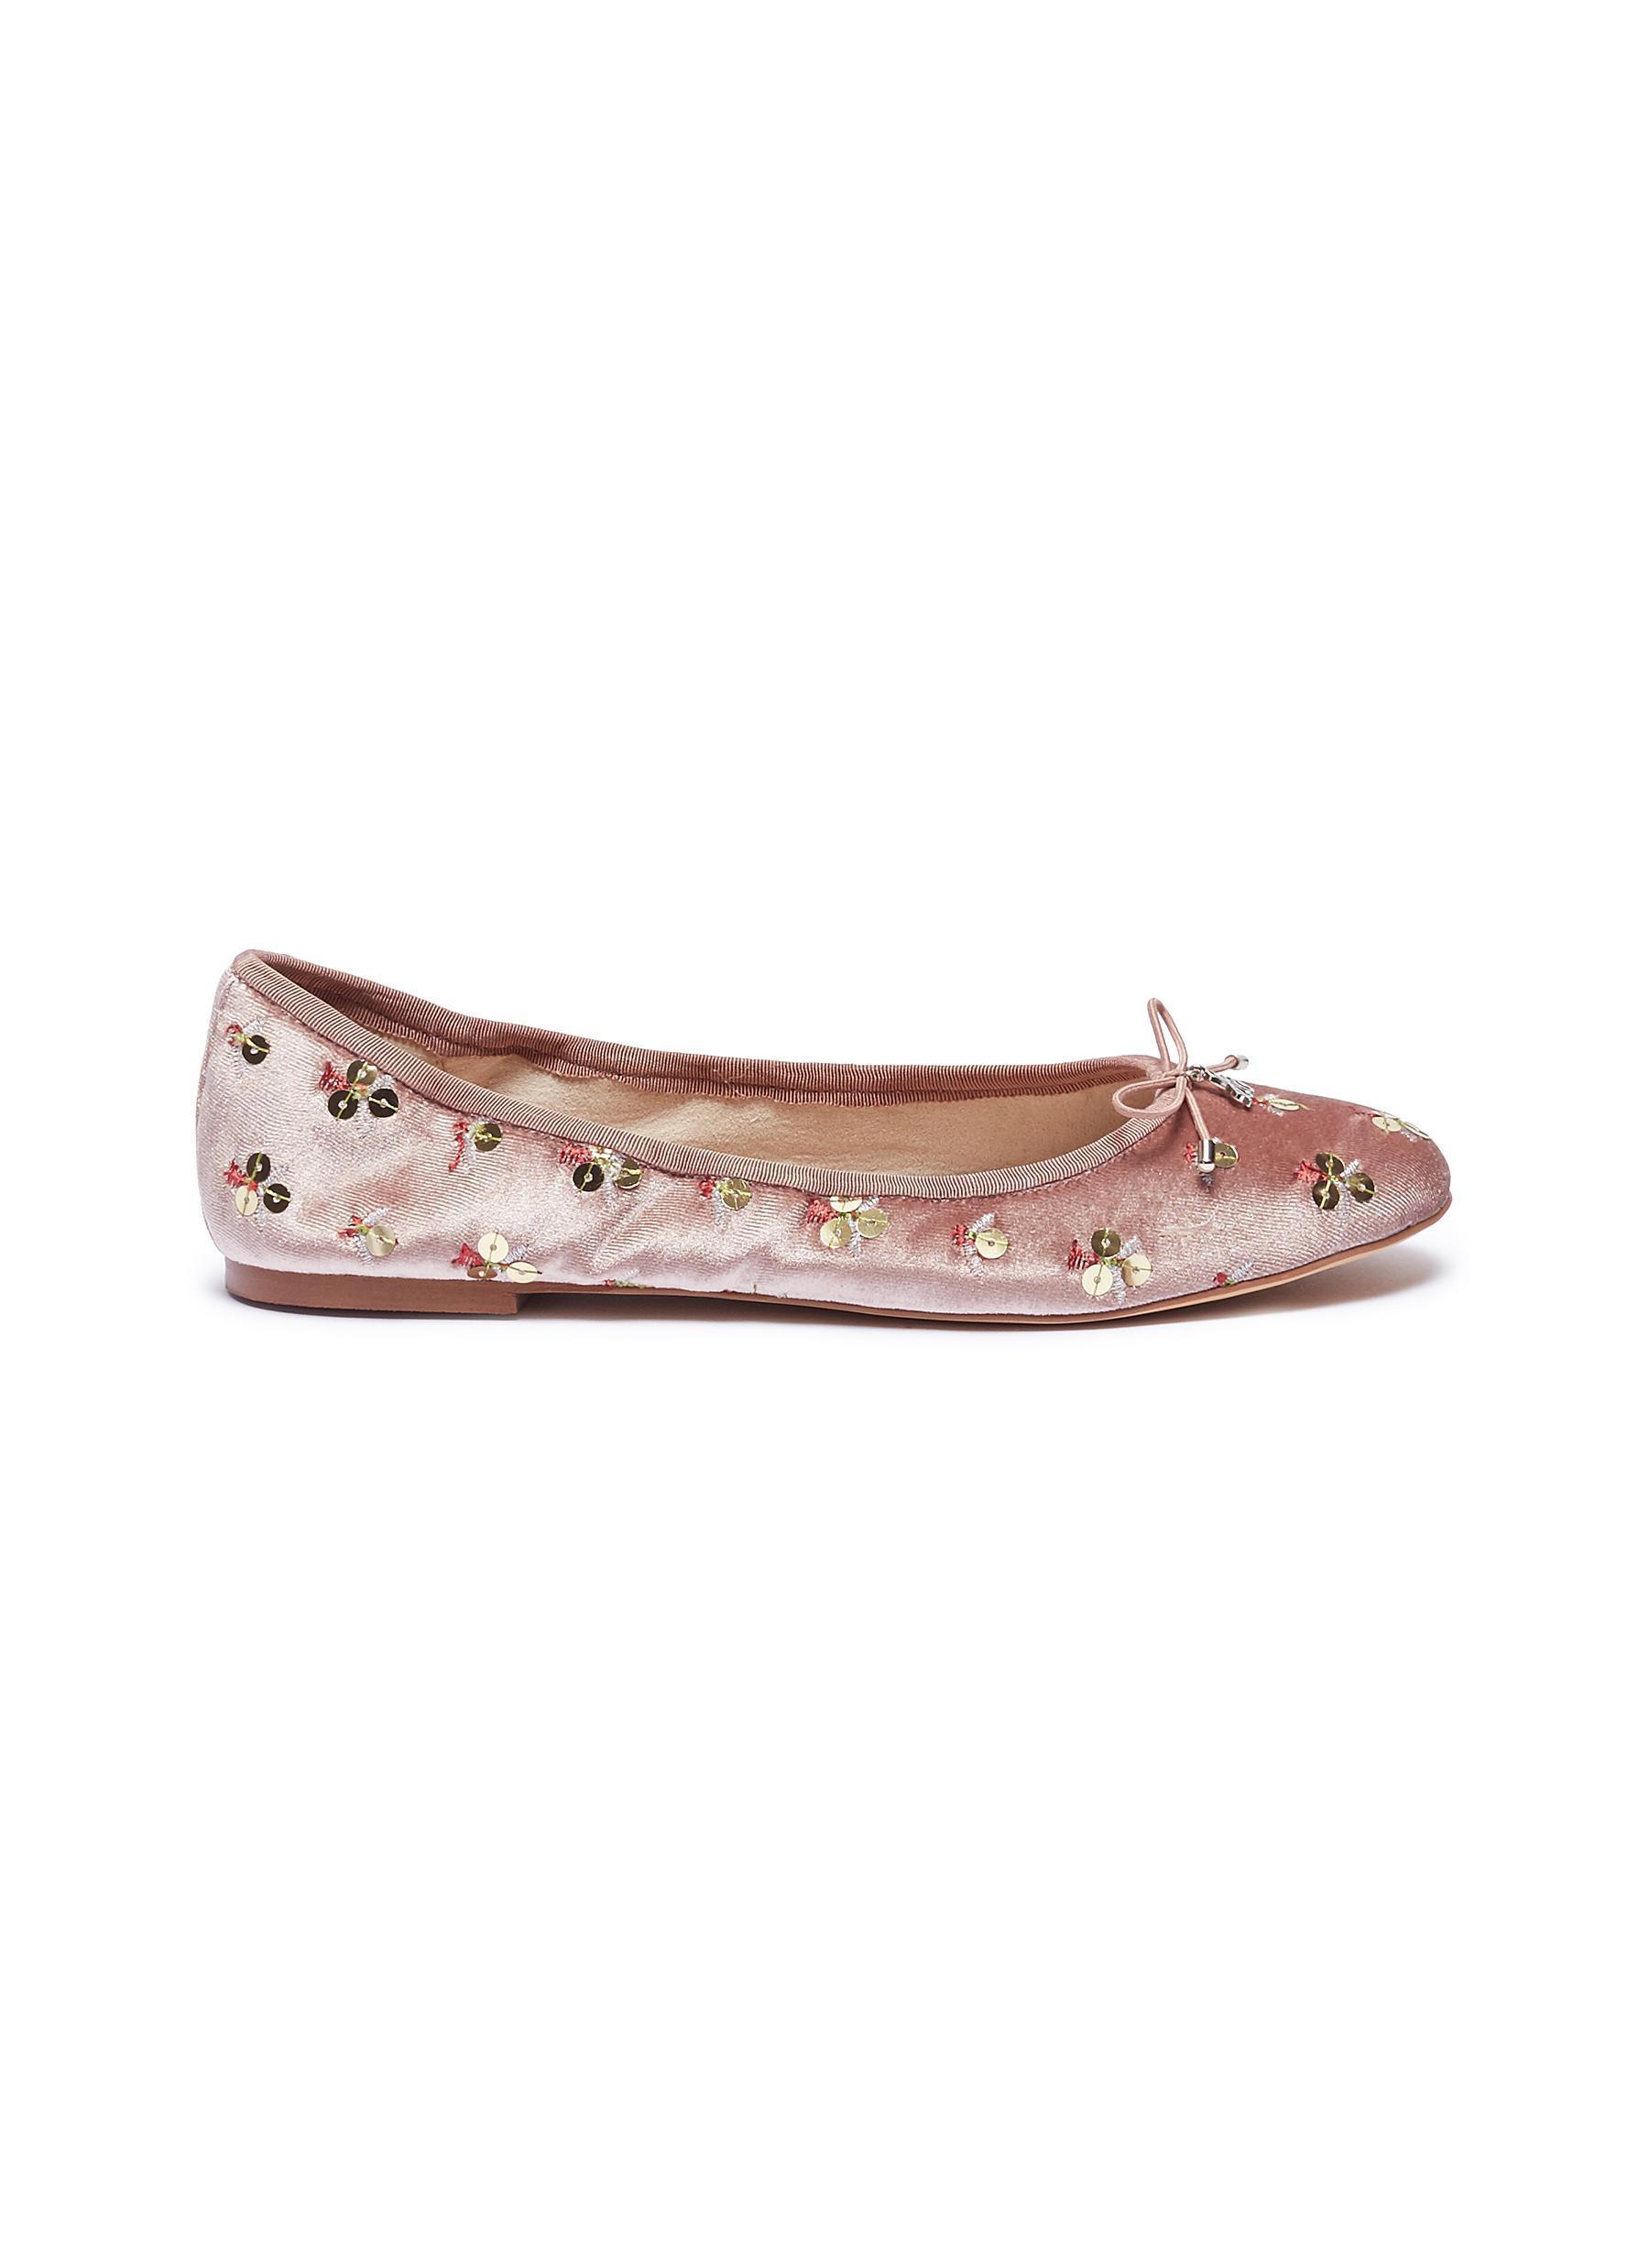 0dc897a305f32 Lyst - Sam Edelman  felicia  Sequinned Velvet Ballet Flats in Pink